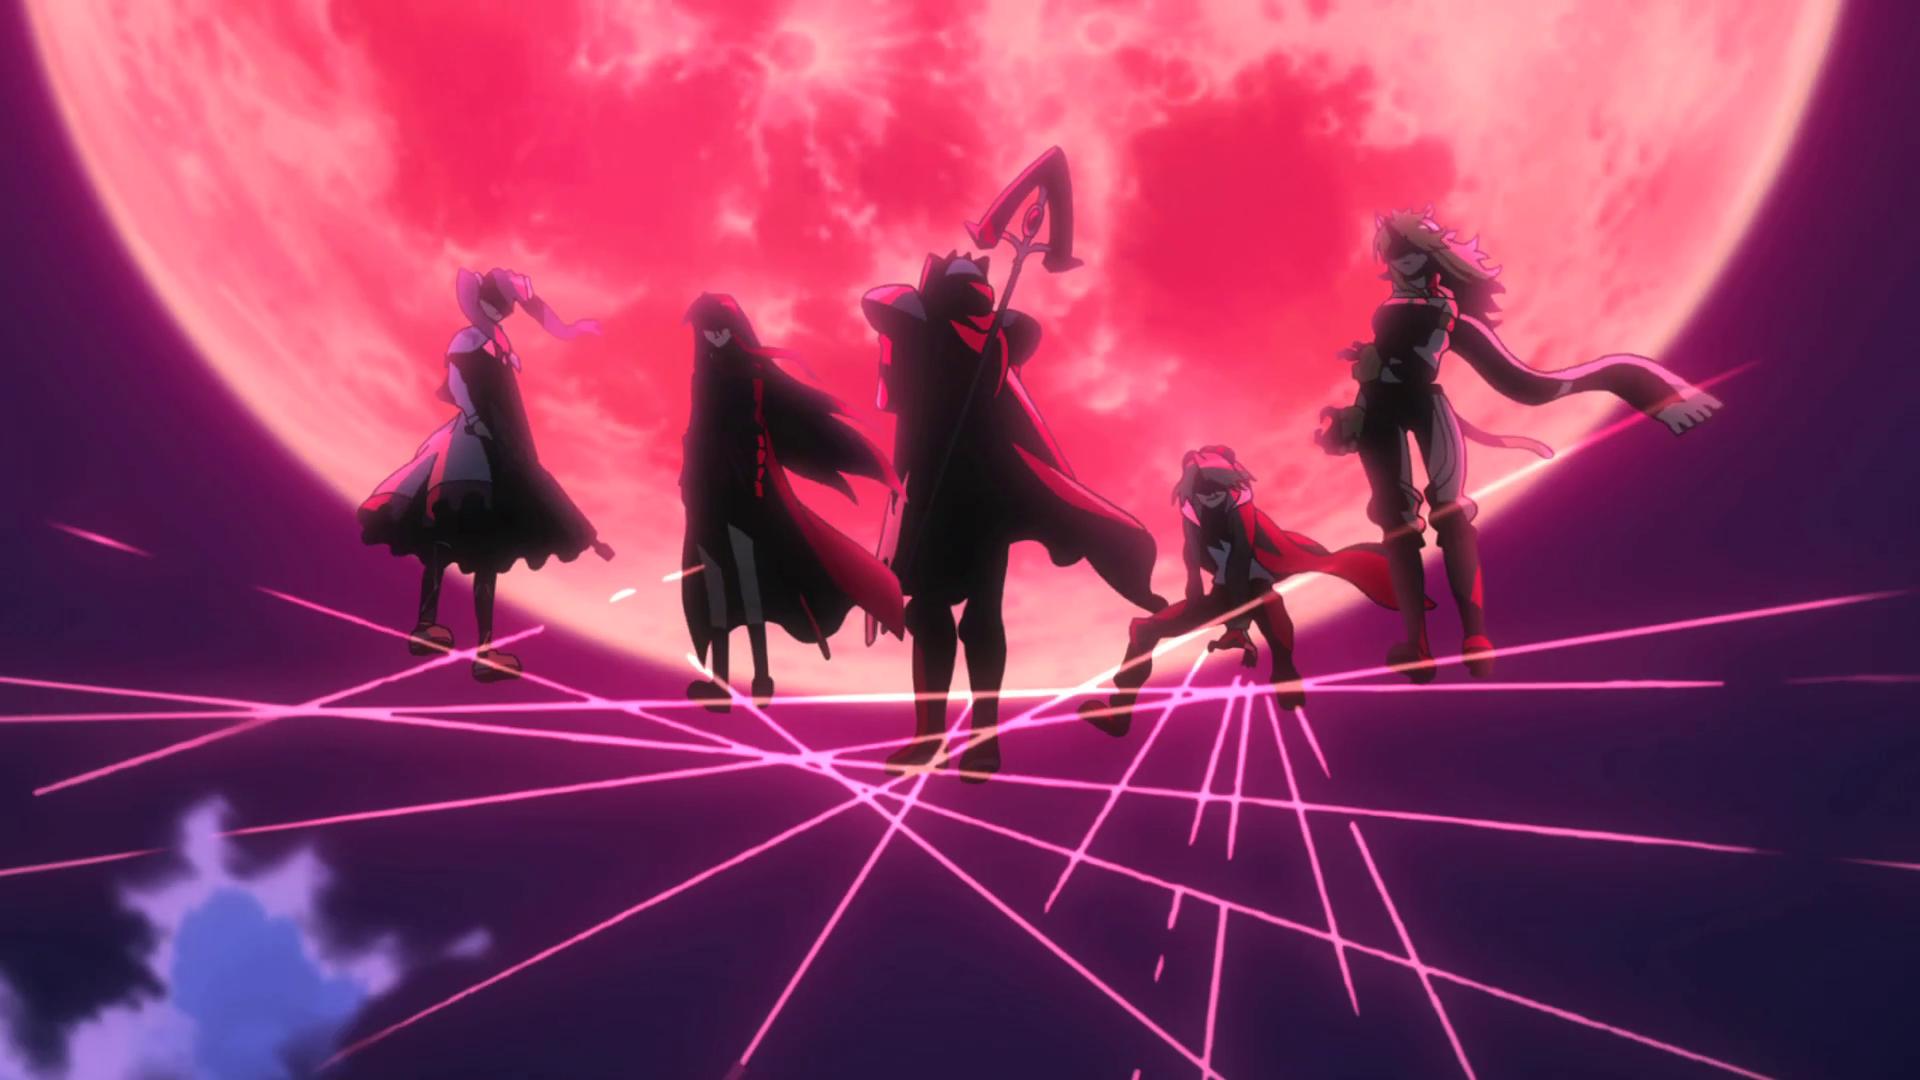 Anime Wallpaper Akame Ga Kill Anime Top Wallpaper